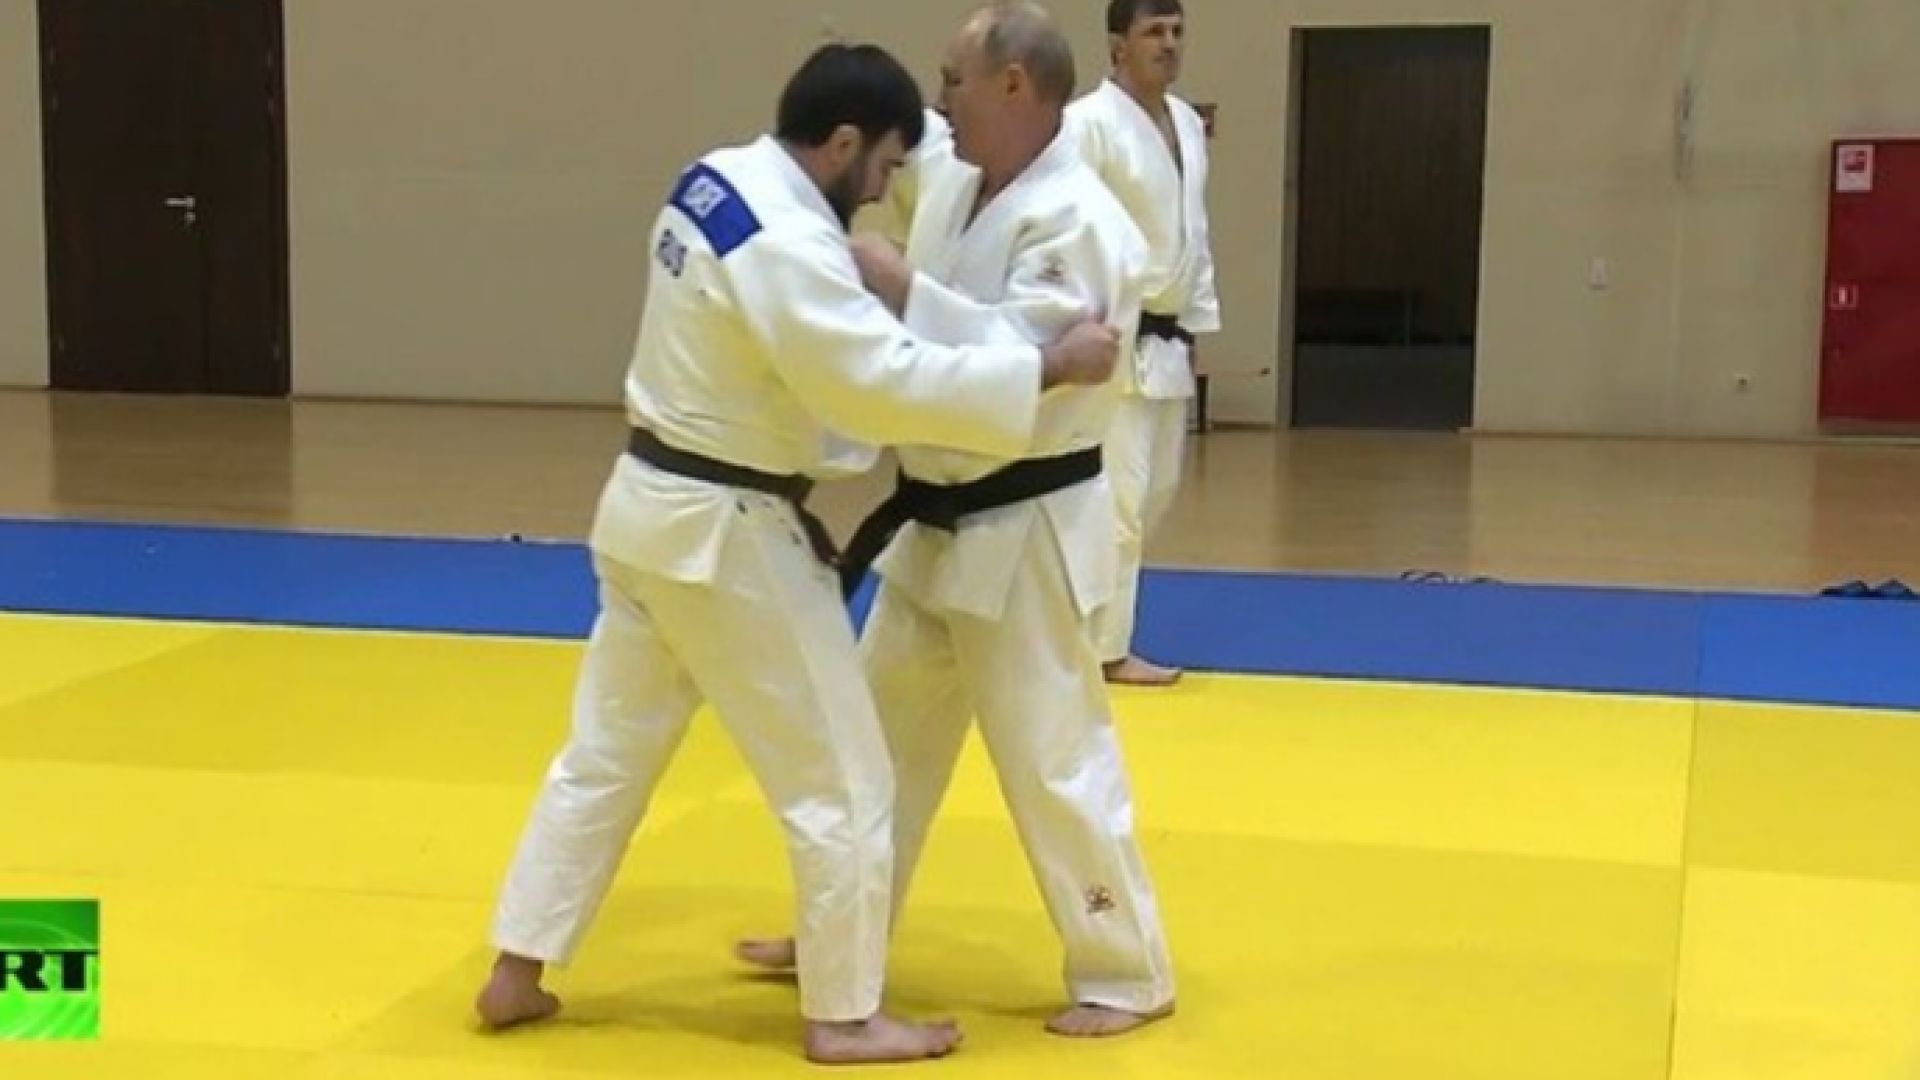 Путин се контузи на тренировка с джудистите в Сочи (видео)